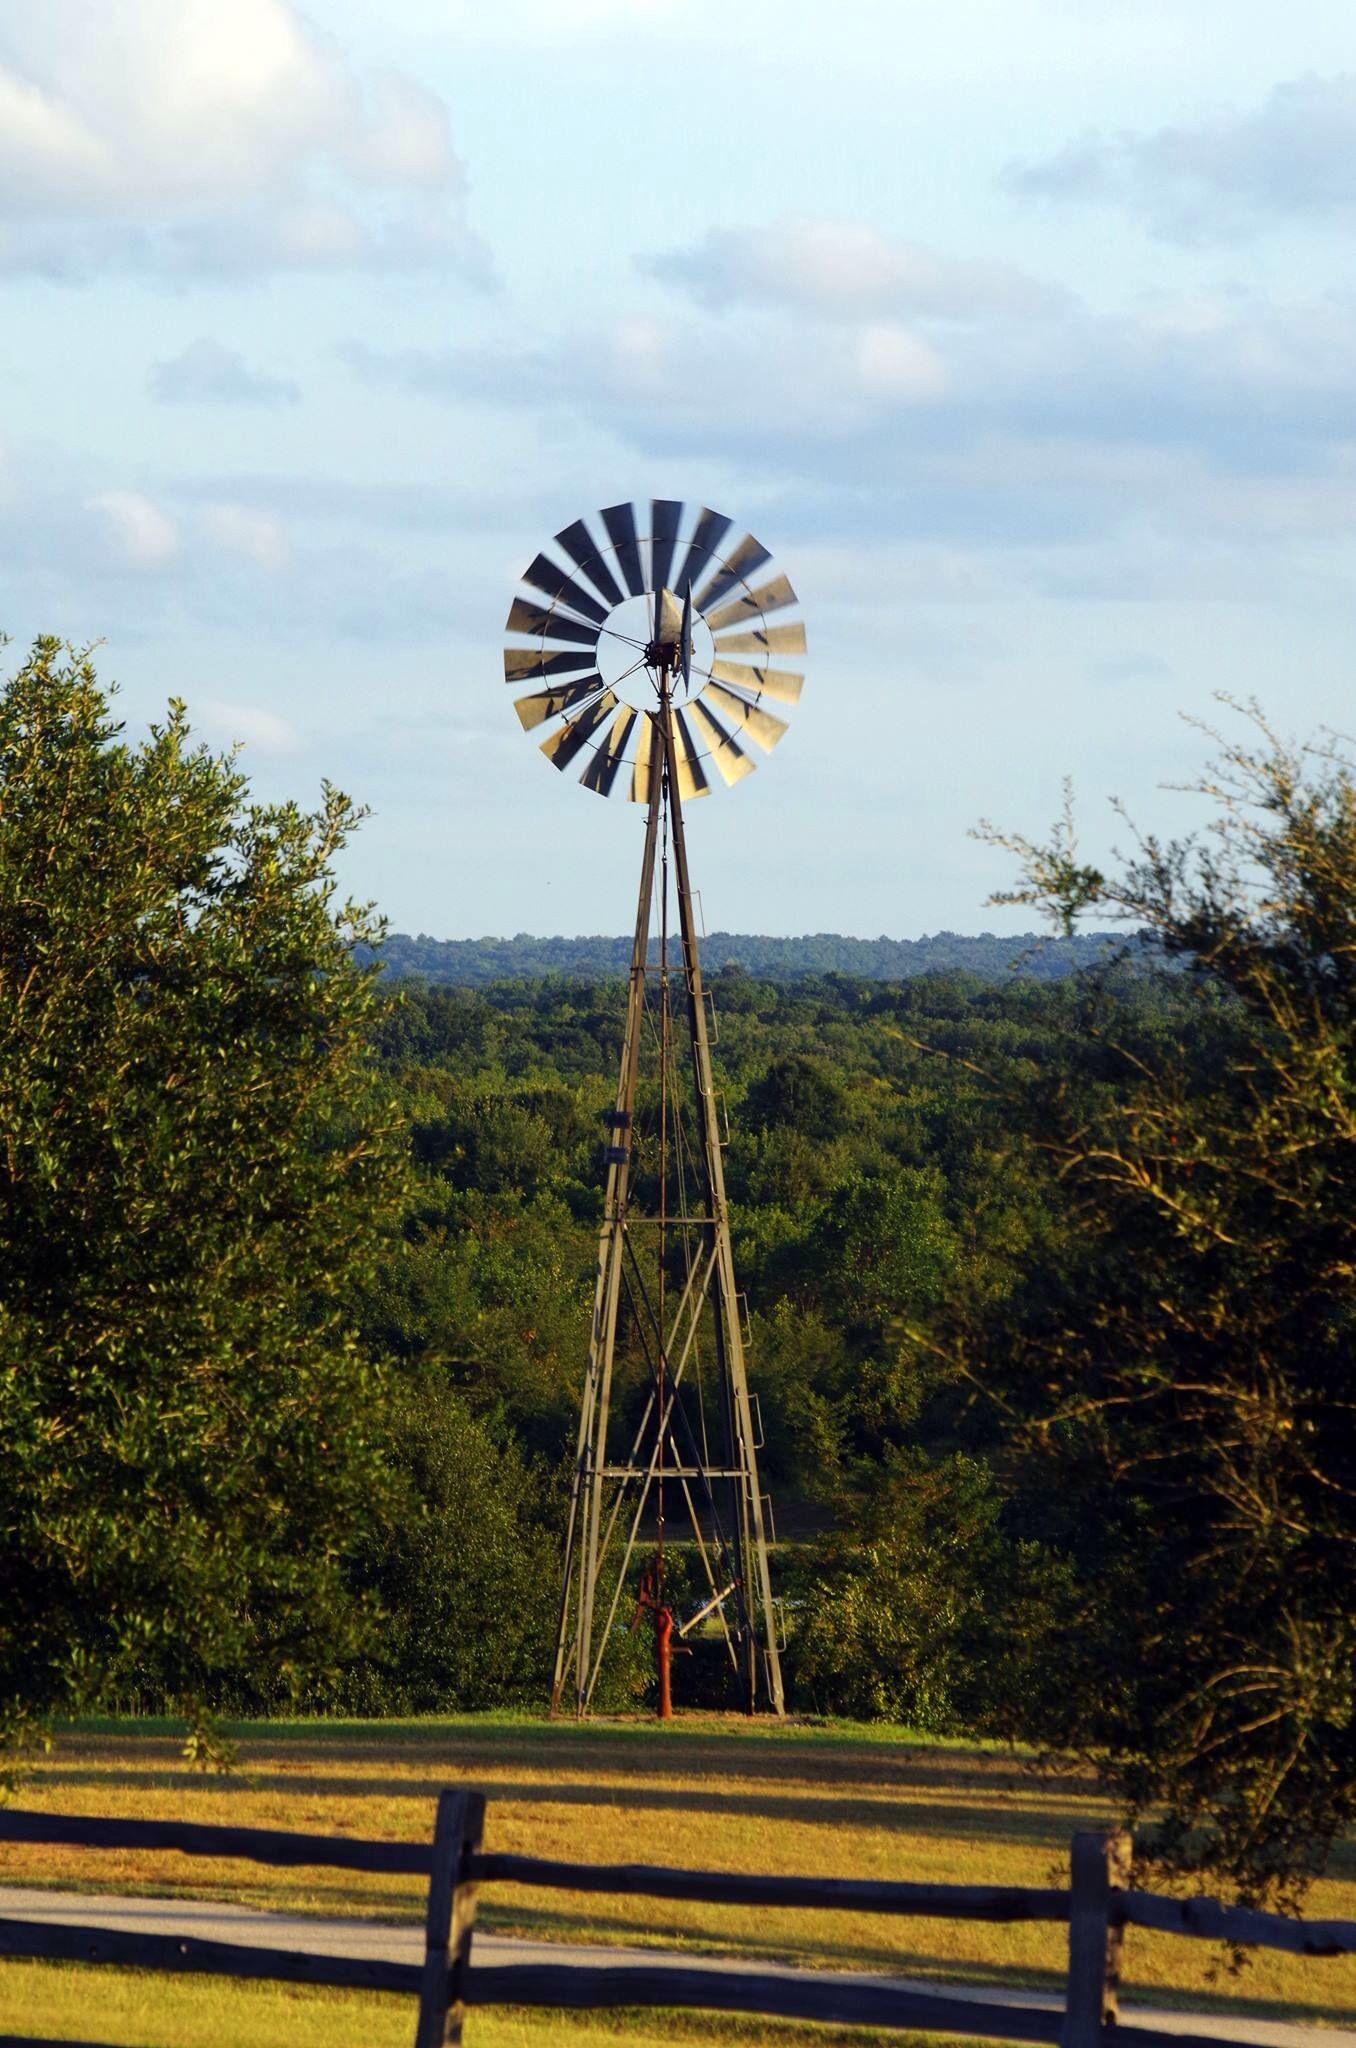 Windmill Near Mineola Texas Windmills Pinterest Old Towers Great Rock Windpower Water Mill Tower